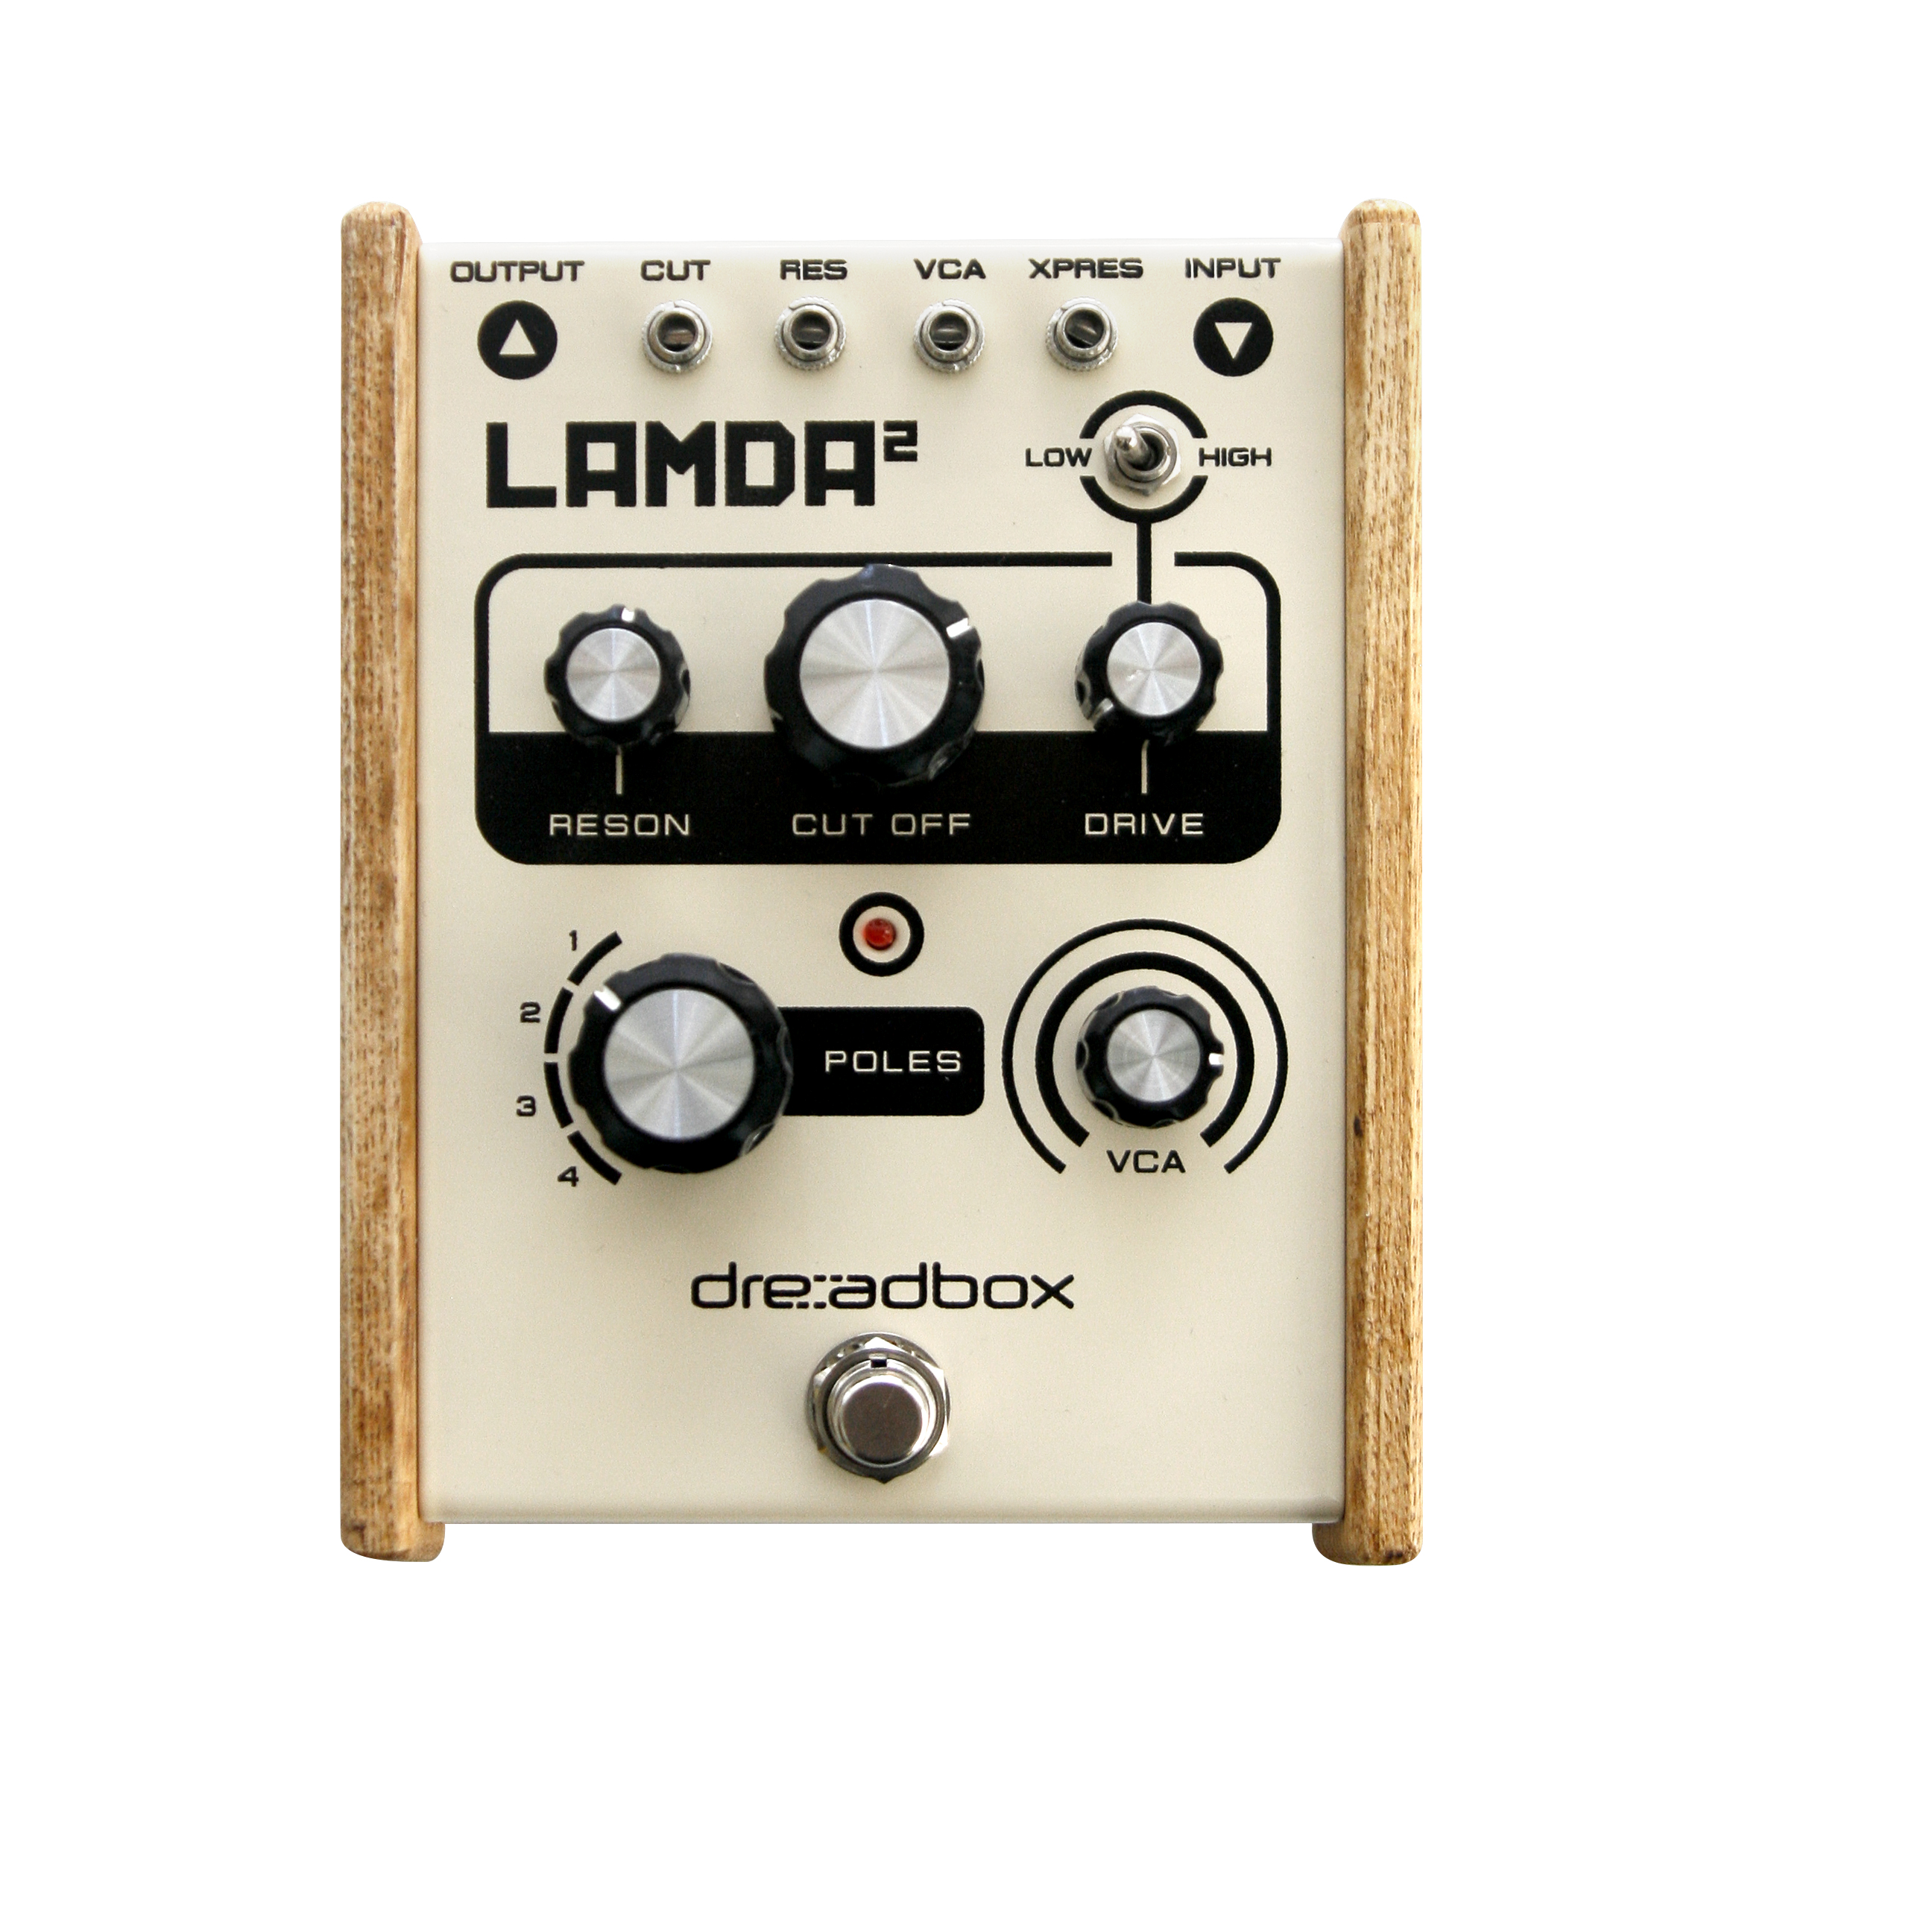 Lamda 2 – TechnoSynth